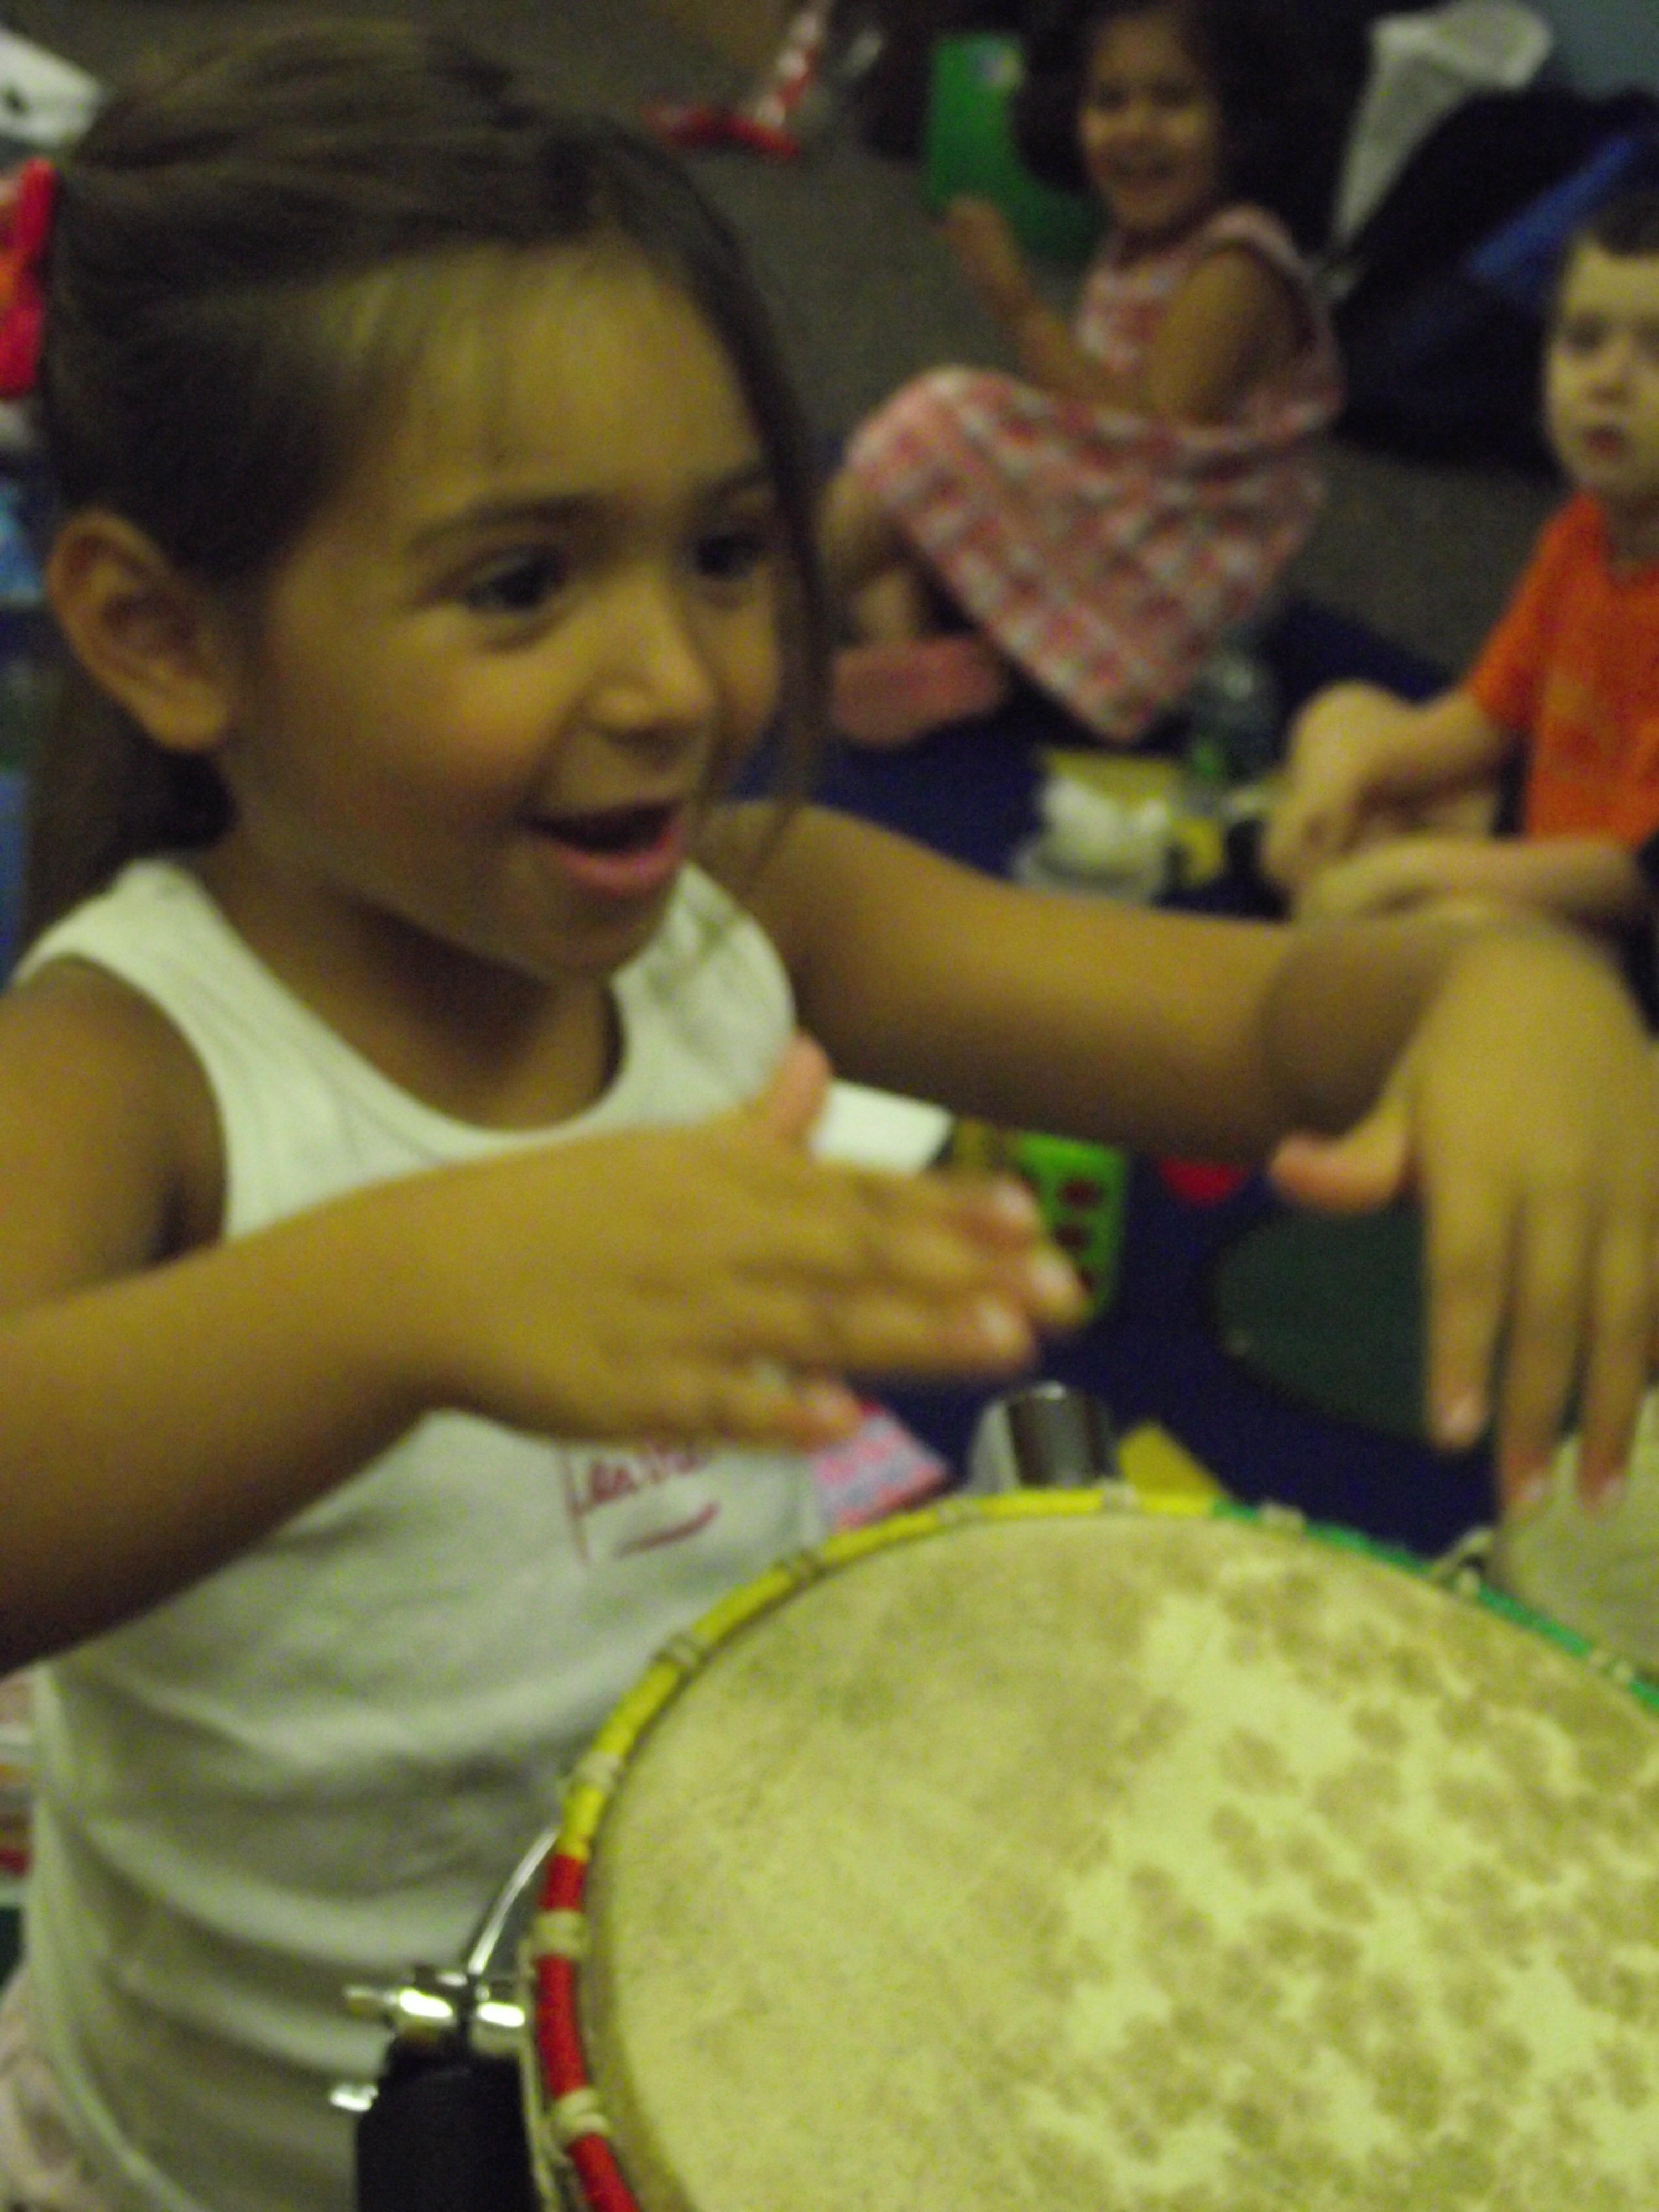 77d96f80ecc688848137_Girl_Drumming.JPG